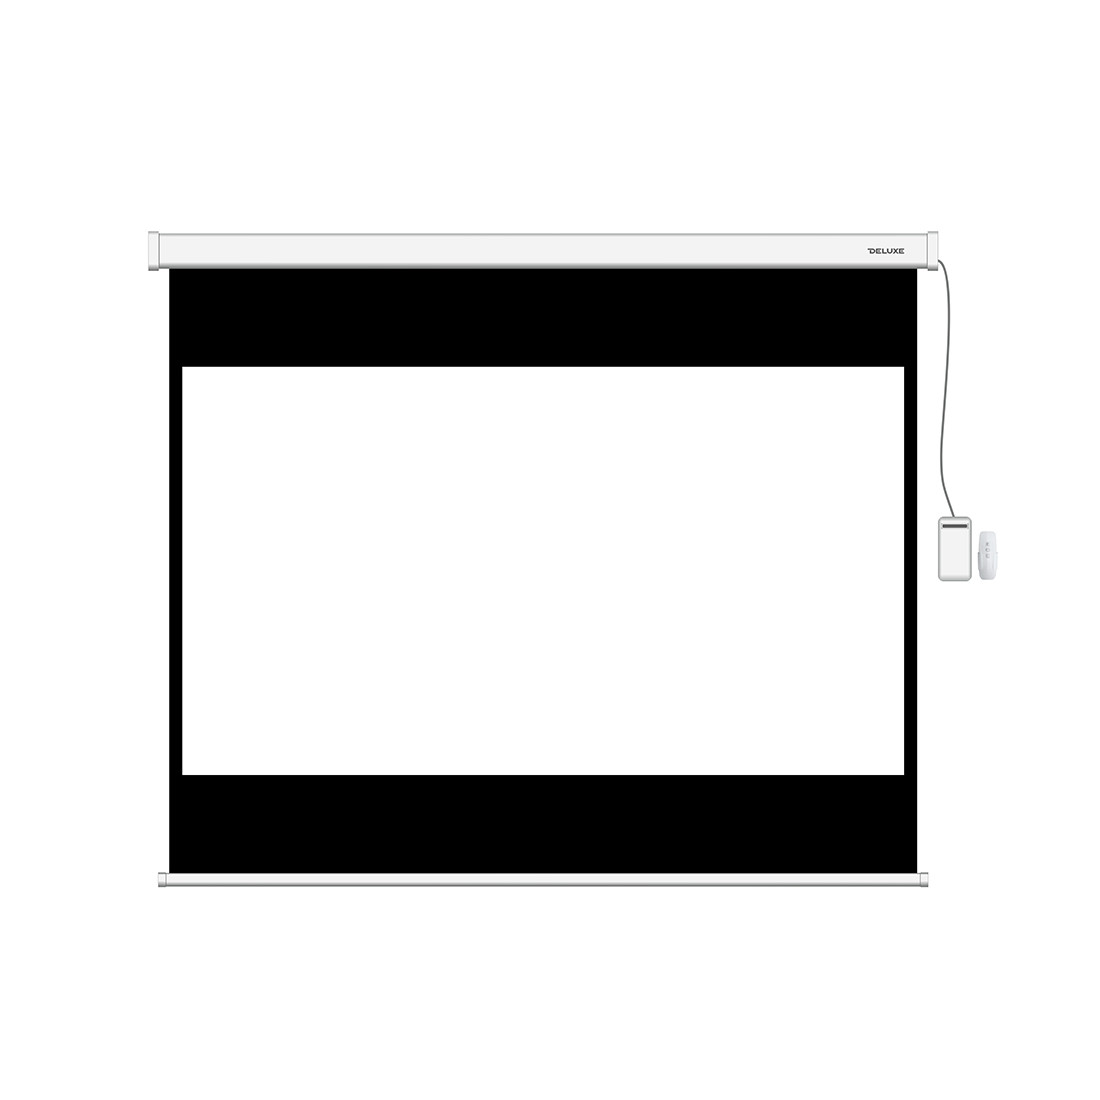 Экран моторизированный (с пультом Д/У) Deluxe DLS-ERC274х206W